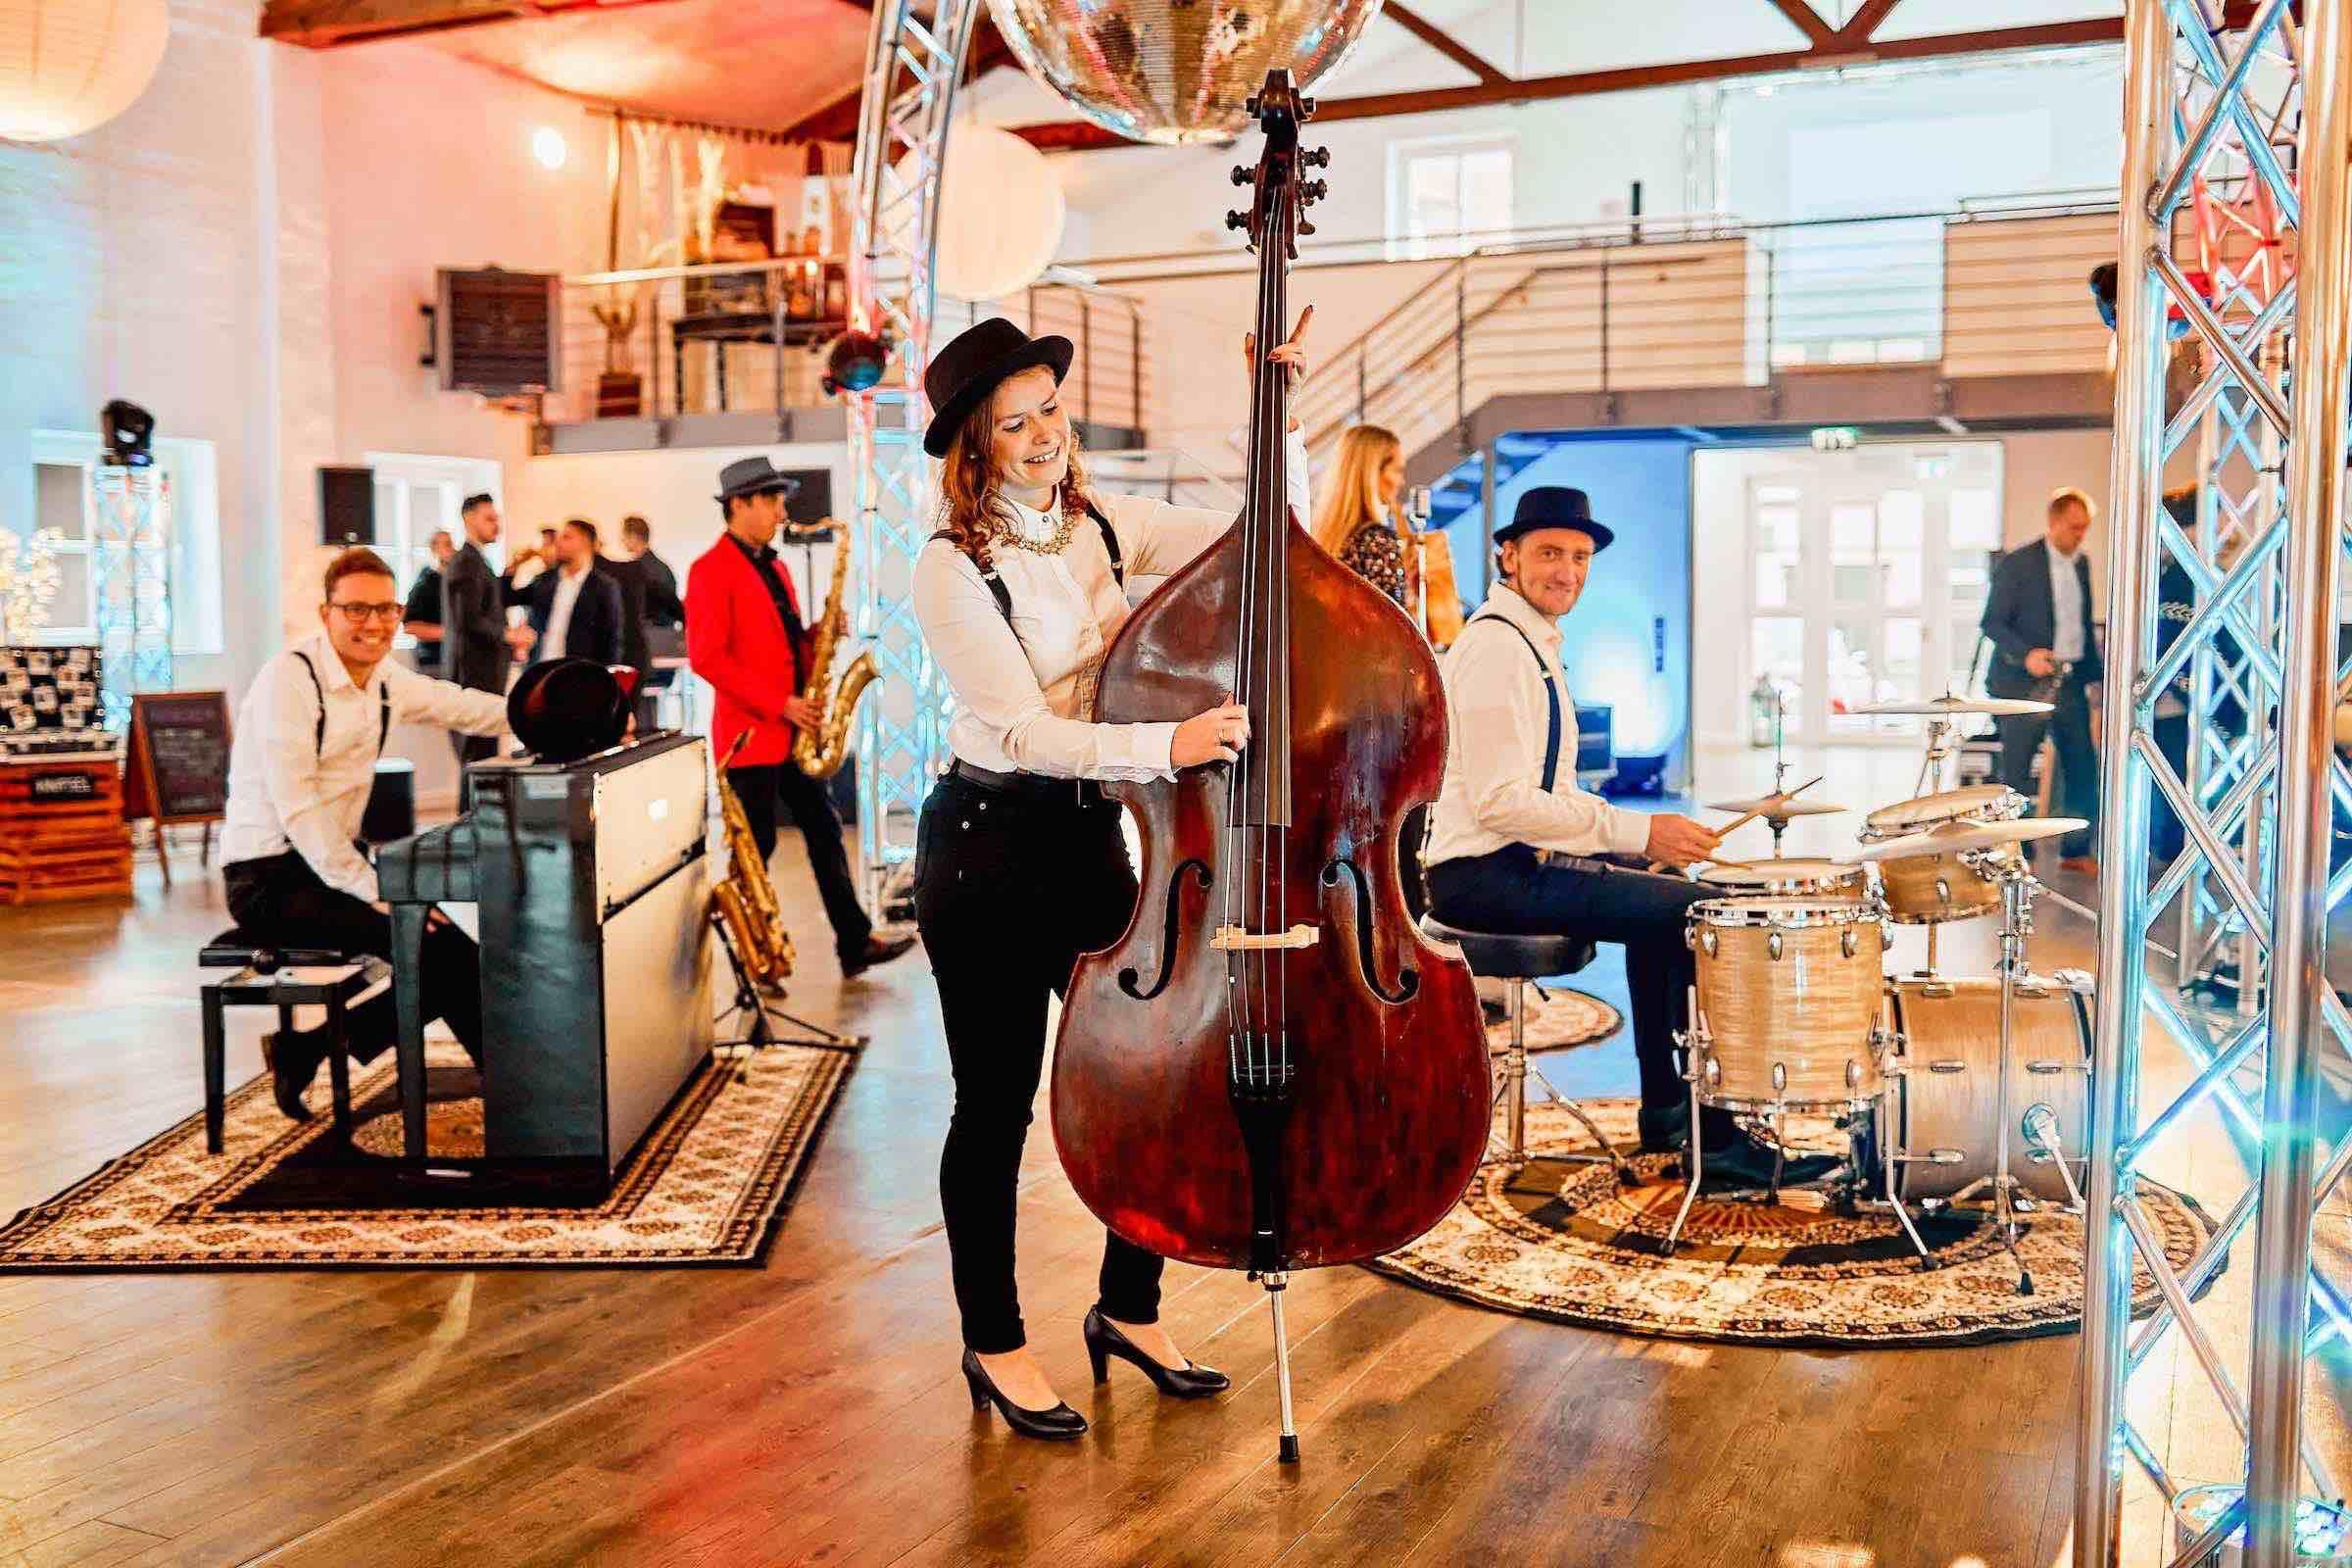 Band | Hochzeit | Empfang | Sektempfang | Gala | Messe | Event | Hamburg | Popband | Jazzband | Sektempfang | Kontrabass | Piano | Schlagzeug | Gesang | Party | Trauung | Dinner | Buchen | Mieten | Hamburgfeiert